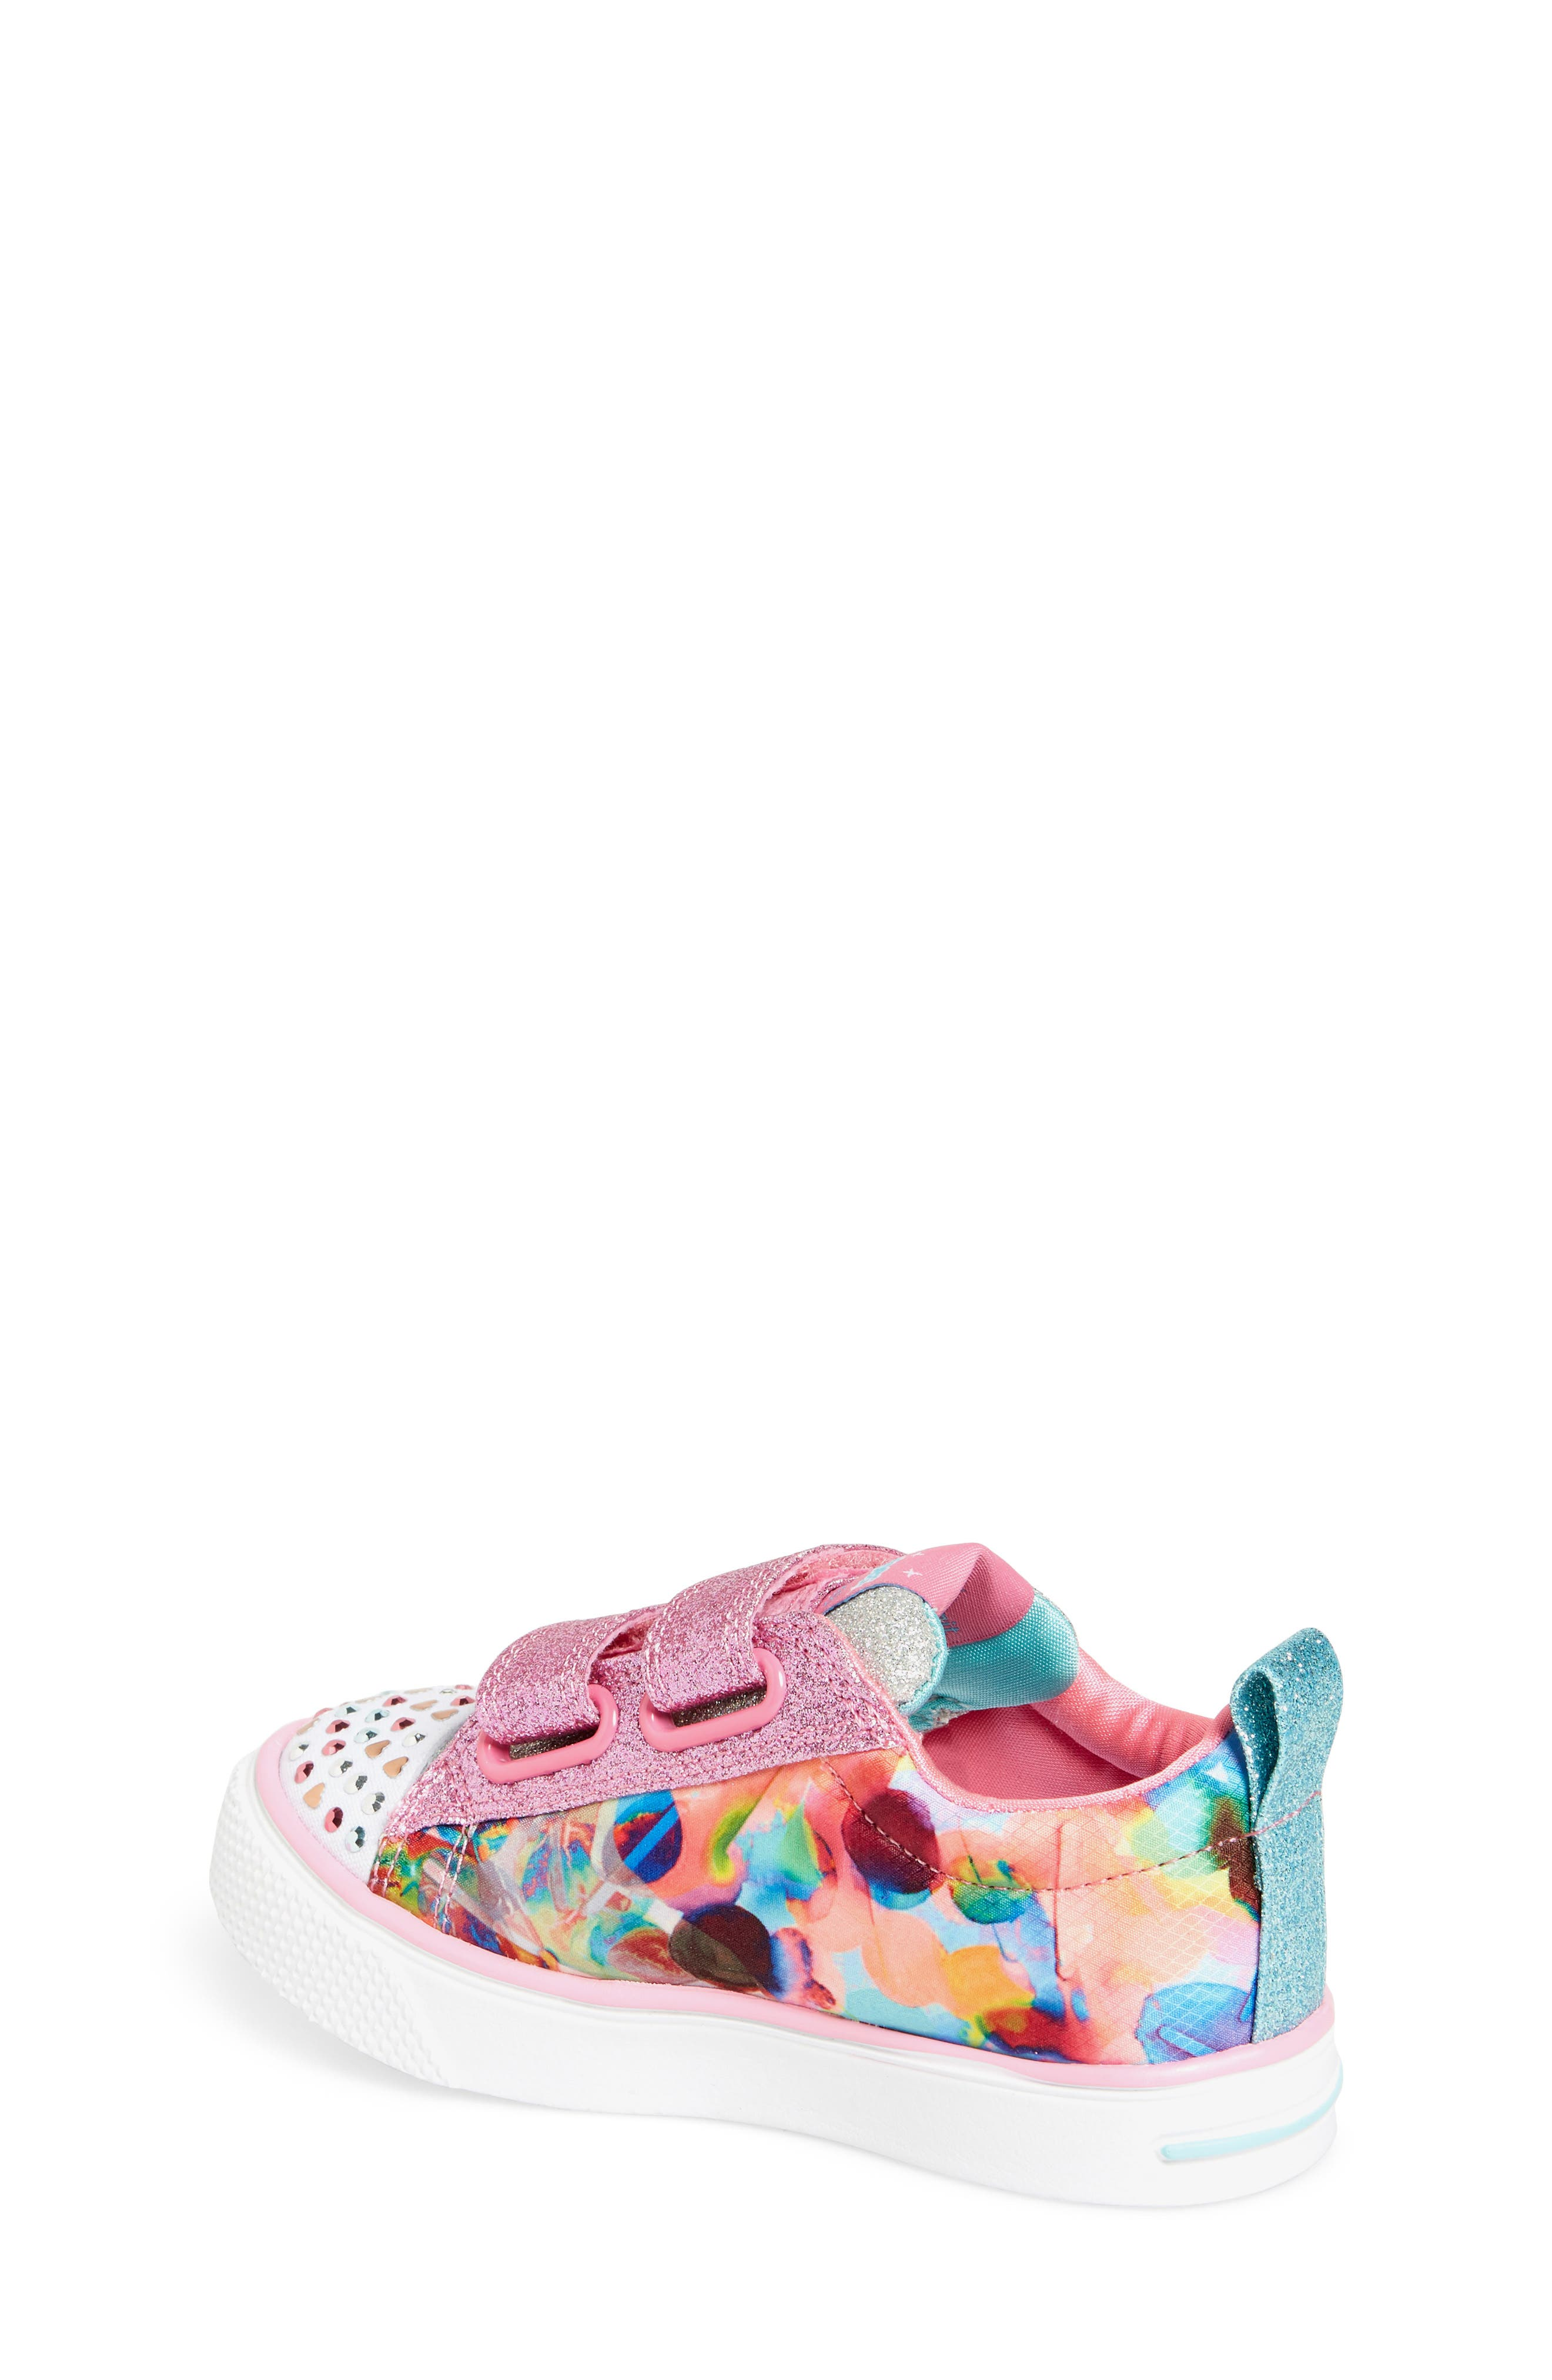 Twinkle Breeze 2.0 Princess Sneaker,                             Alternate thumbnail 2, color,                             Multi